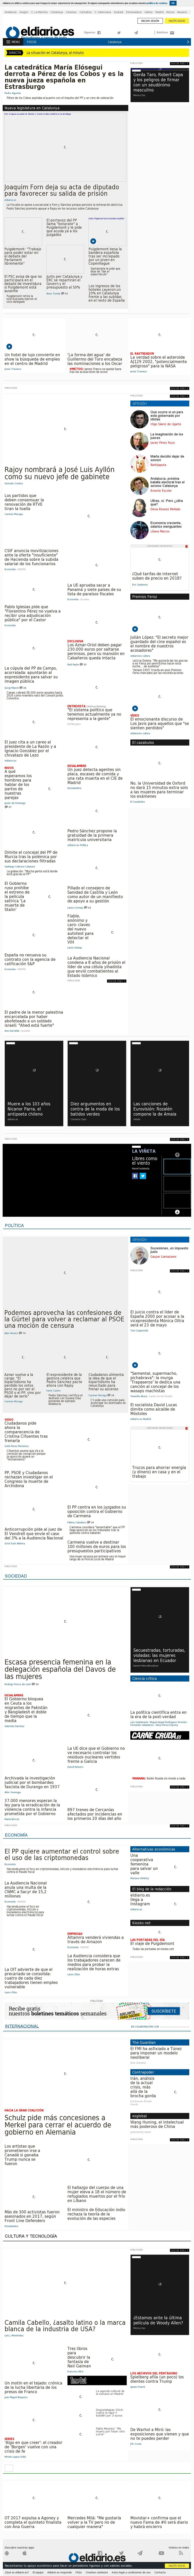 El Diario at Tuesday Jan. 23, 2018, 8:03 p.m. UTC